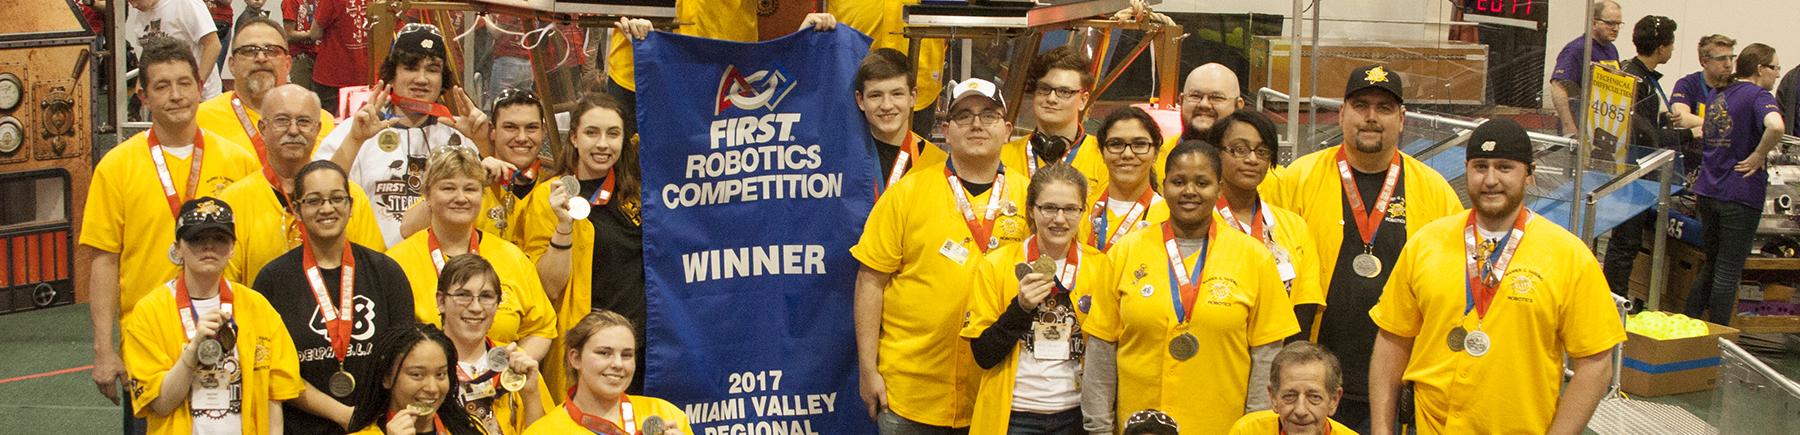 RoboticsWinsMiamiValley1